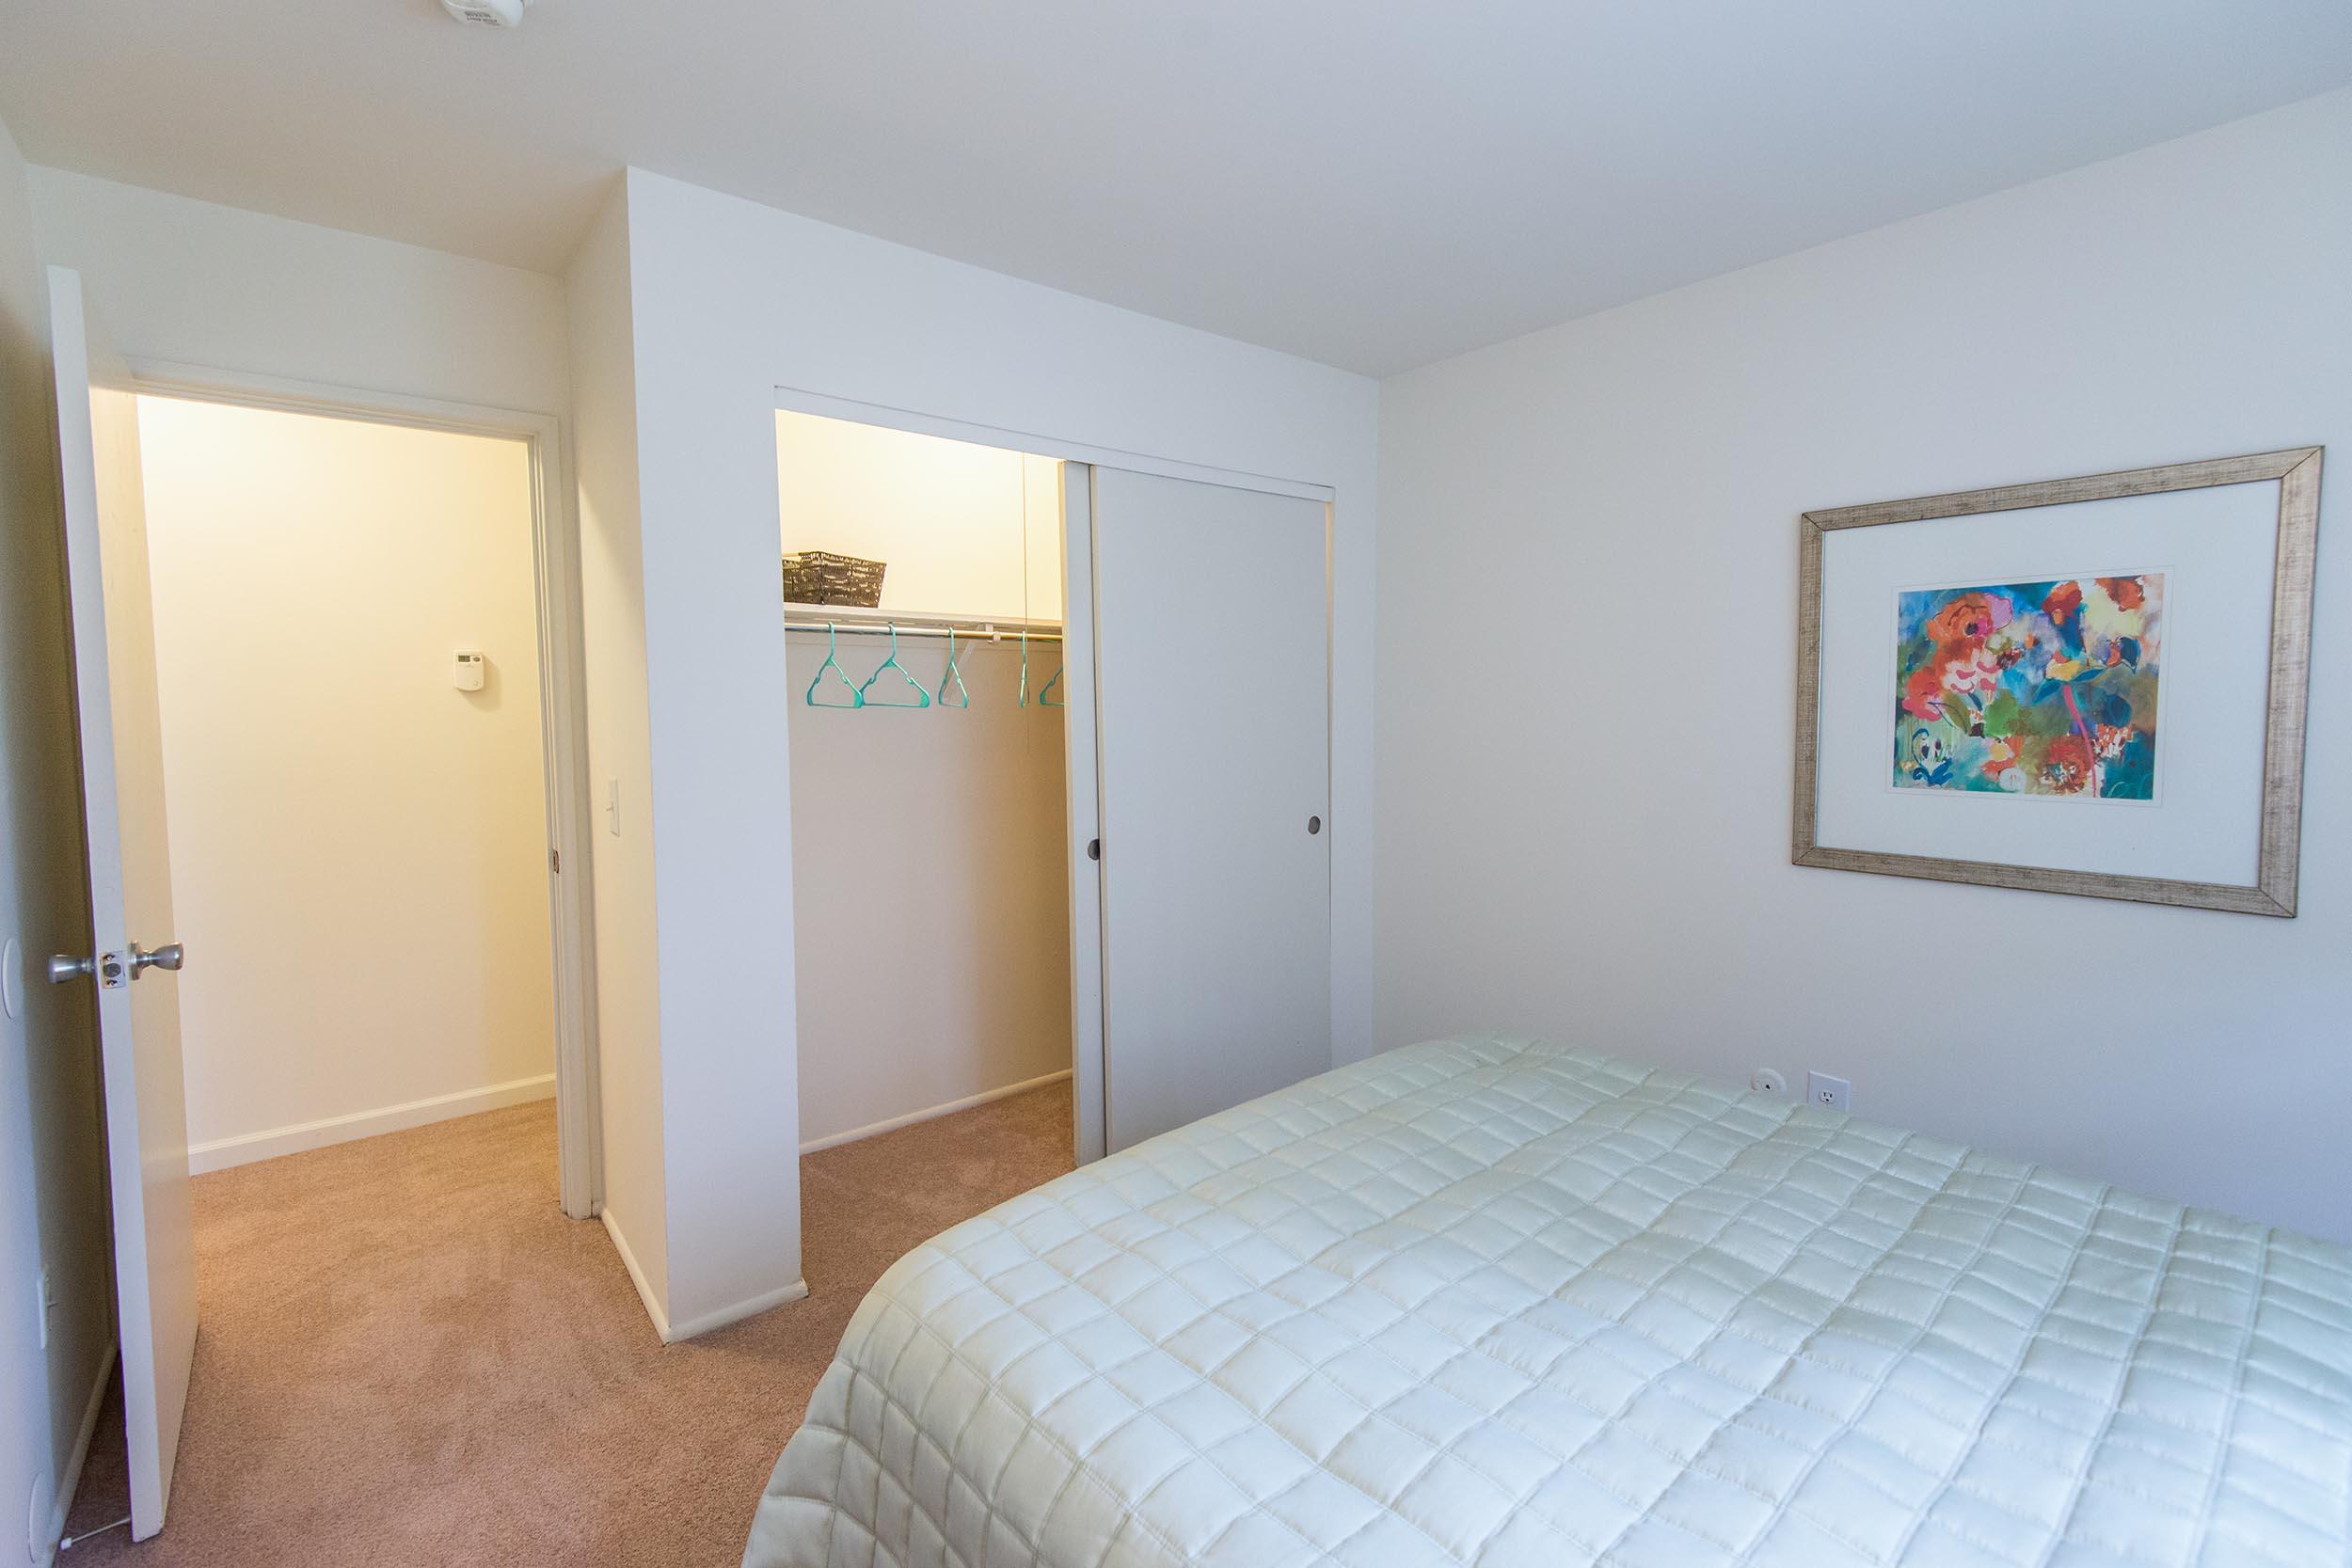 Tv-20860-20bedroom-20l-202-2